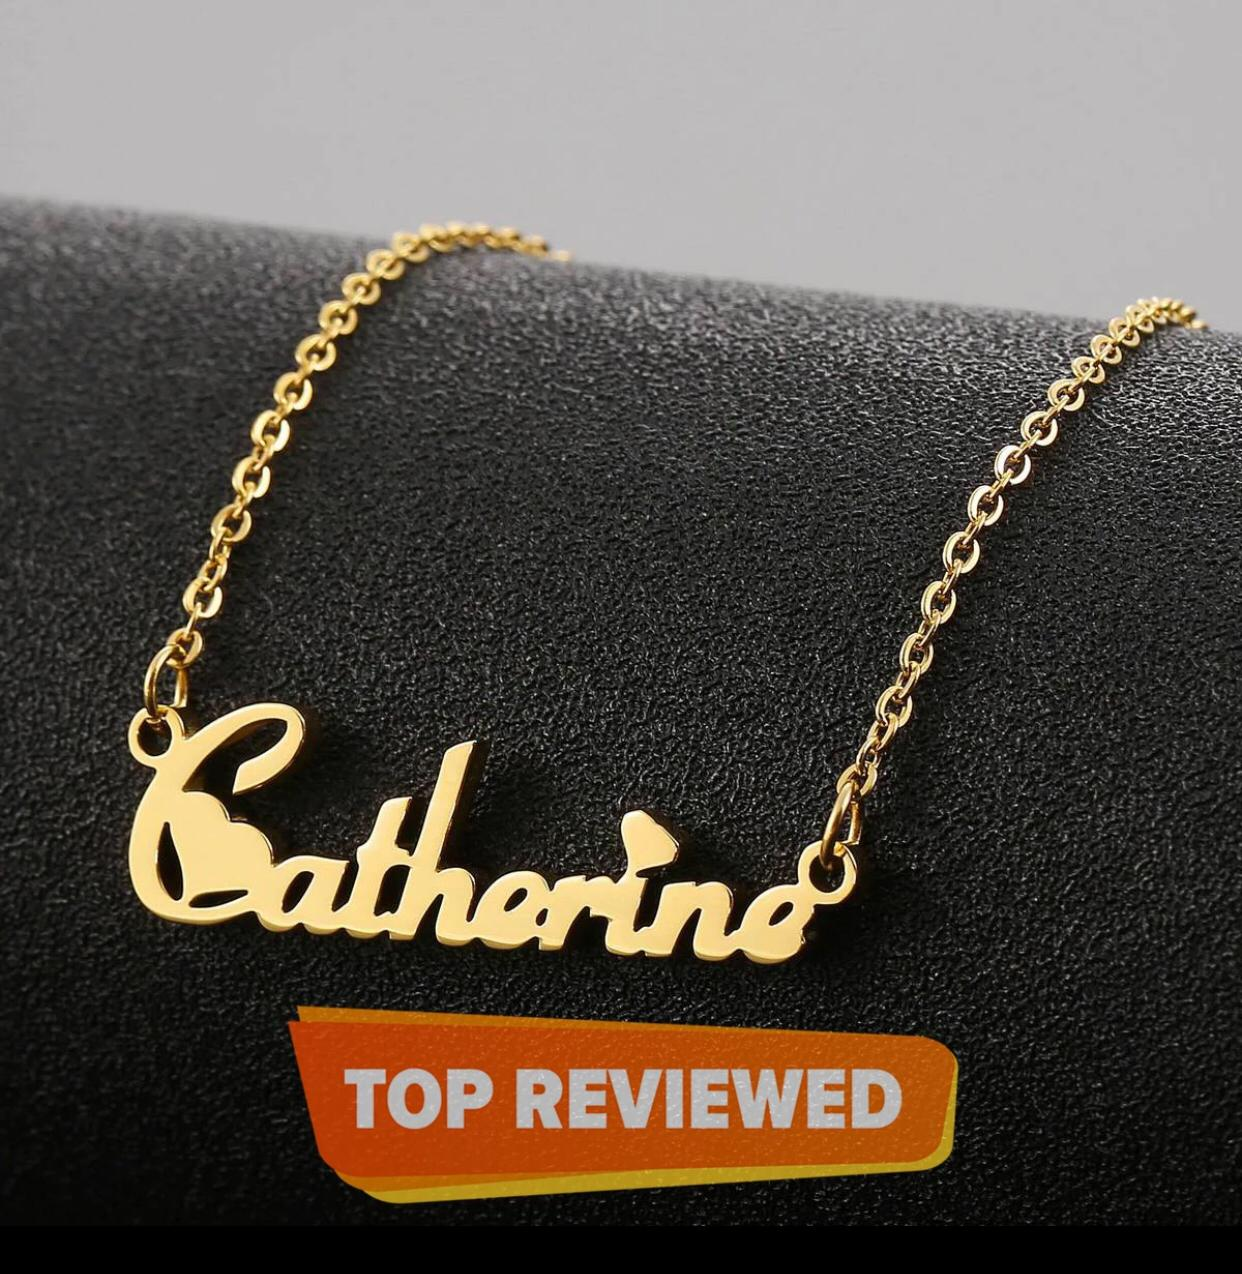 Customized Jewelry Fiolex Girls Single Name Necklace